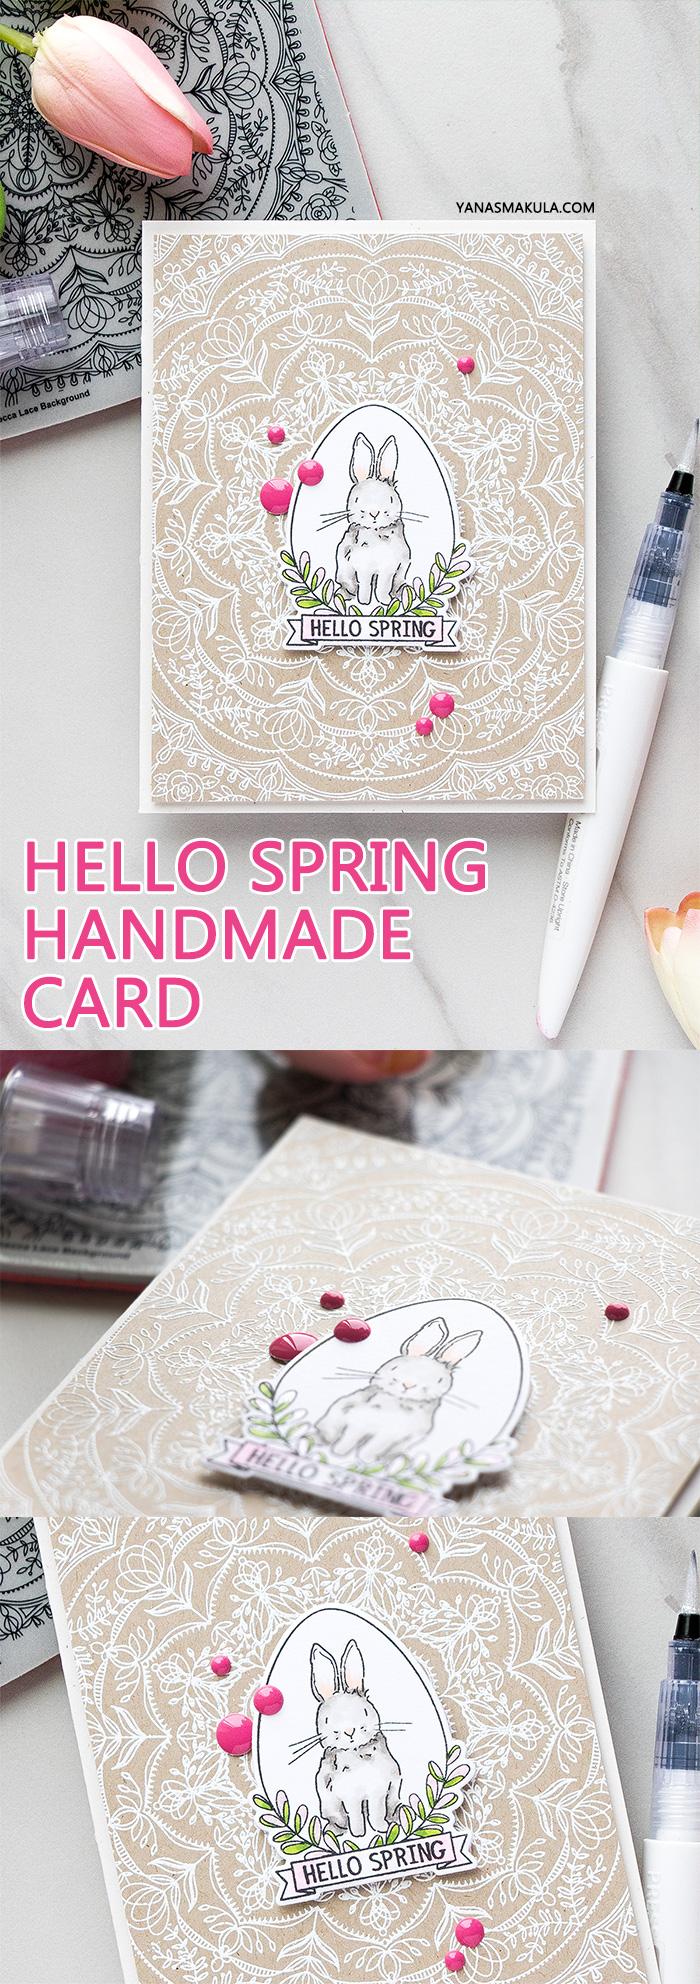 Simon Says Stamp | Hello Spring Bunny card by Yana Smakula using Spring Seeds SSS101700 and Rebecca Lace SSS101741 stamps from Simon Says Stamp. #stamping #adultcoloring #springcard #bunnycard